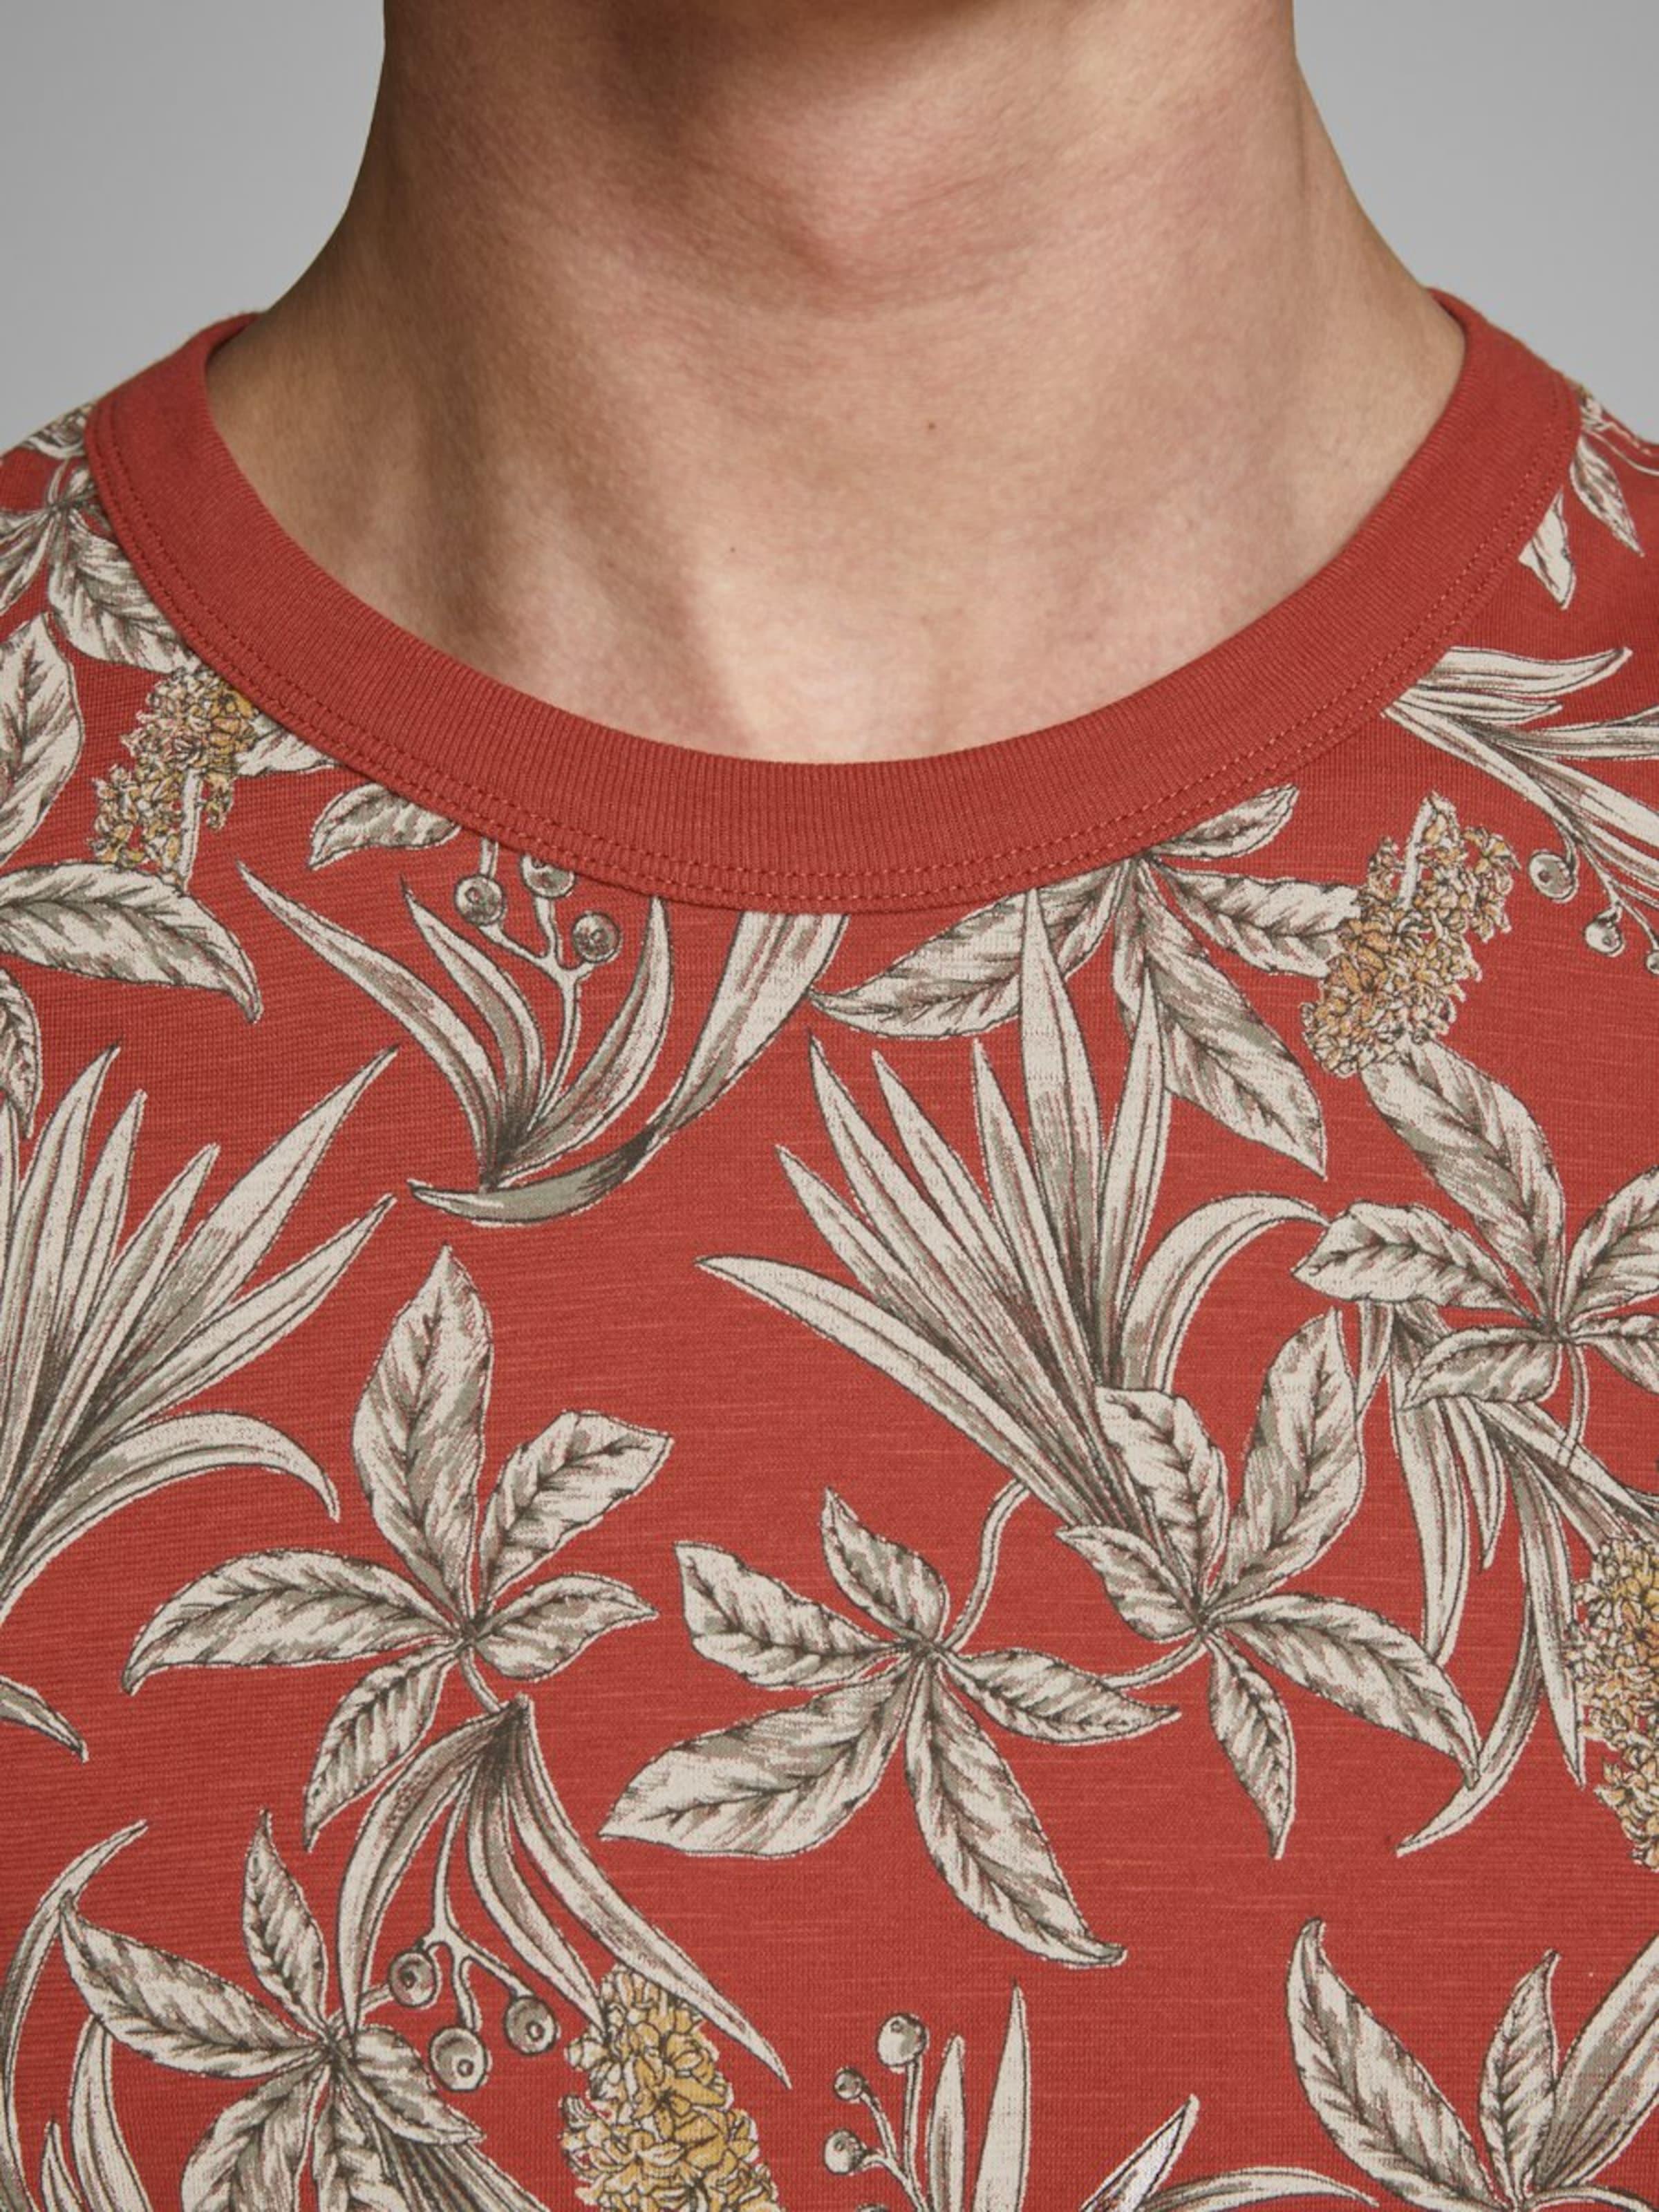 Jones Jackamp; T shirt Karminrot In Alloverprint n0vNOmw8